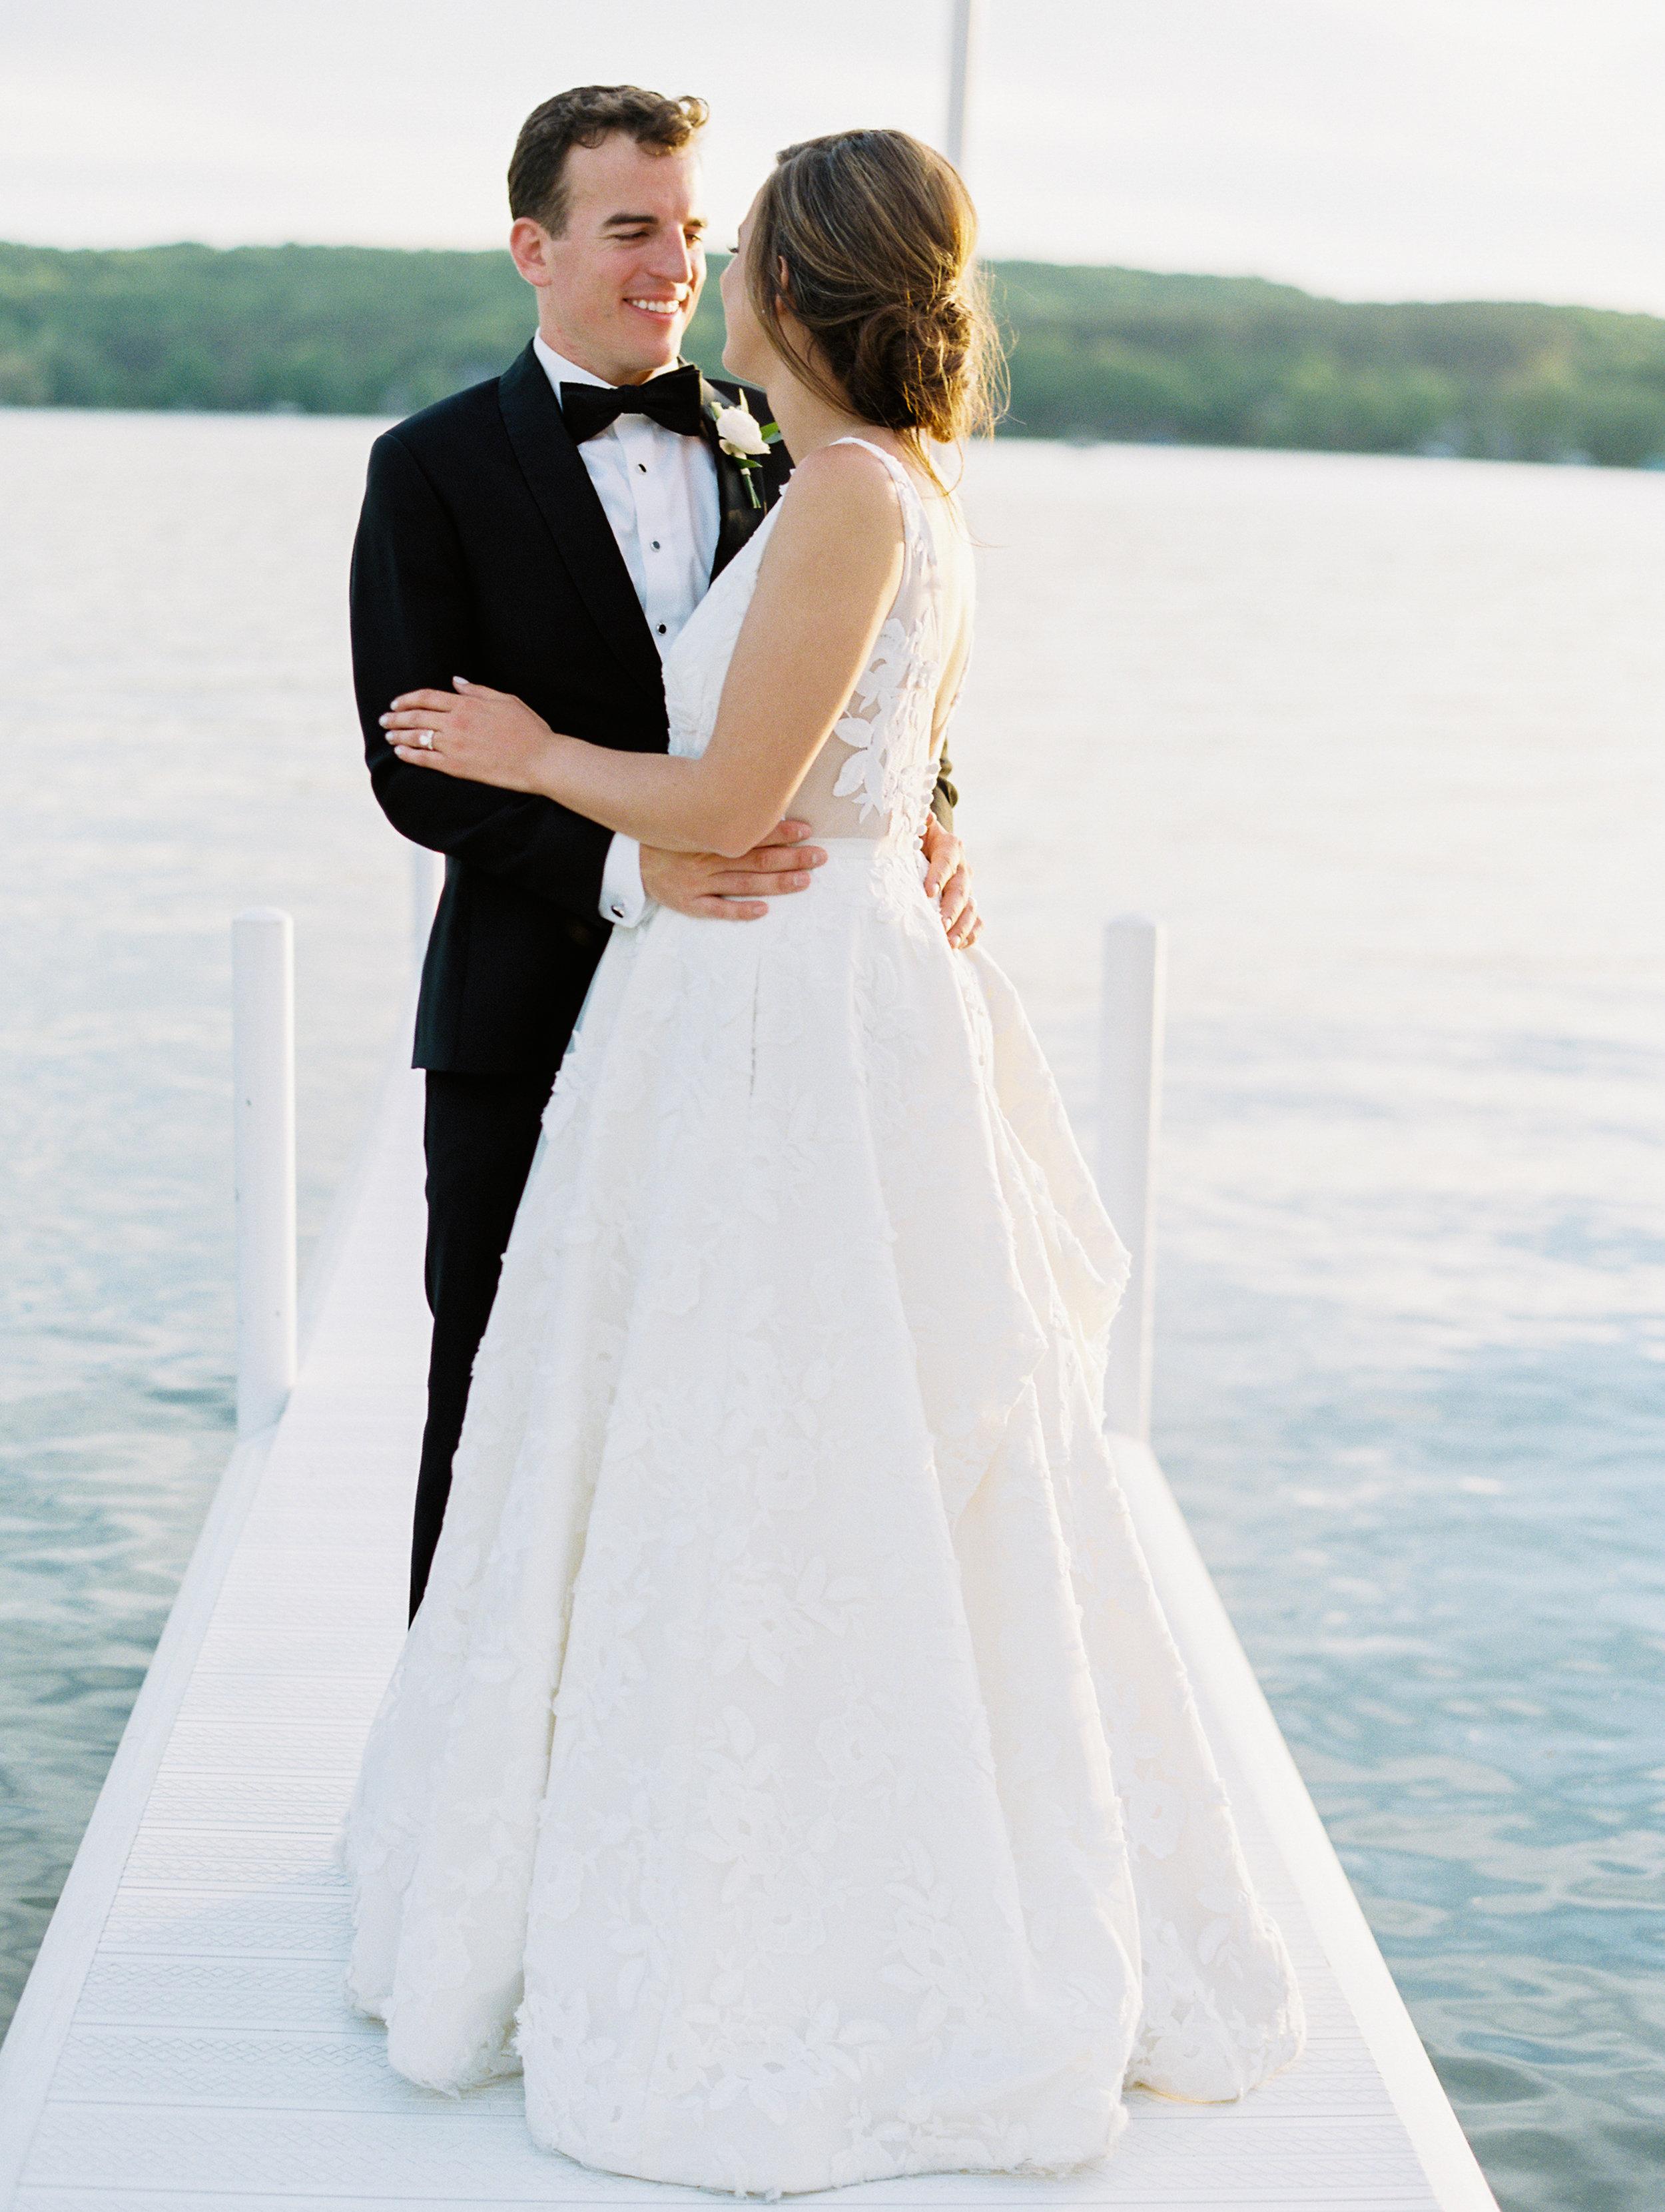 DeGuilio+Wedding+BrideGroomSunsetf-5.jpg